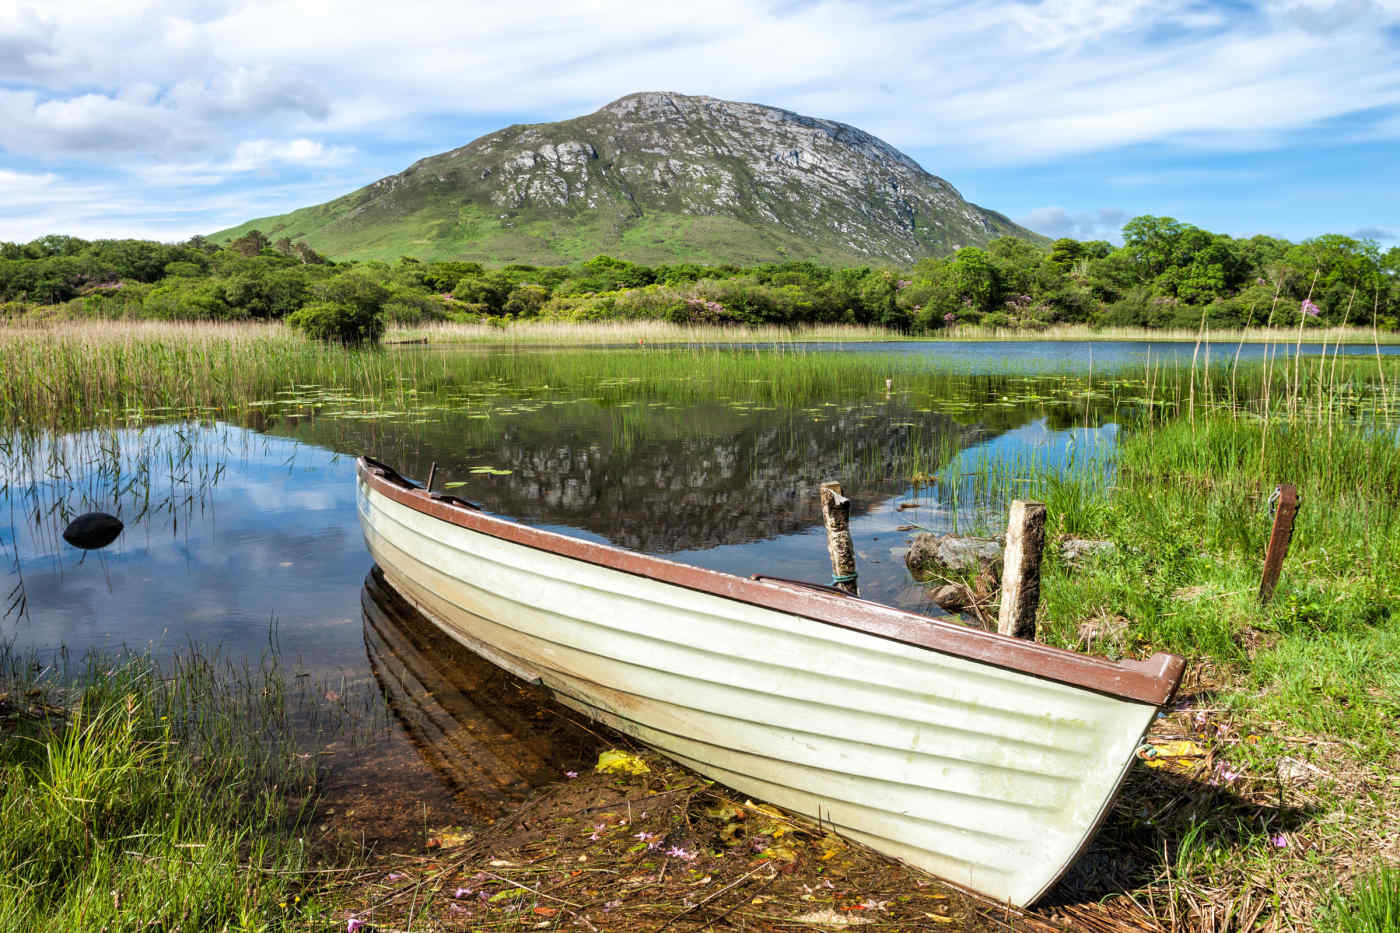 Connemara National Park in County Galway, Ireland